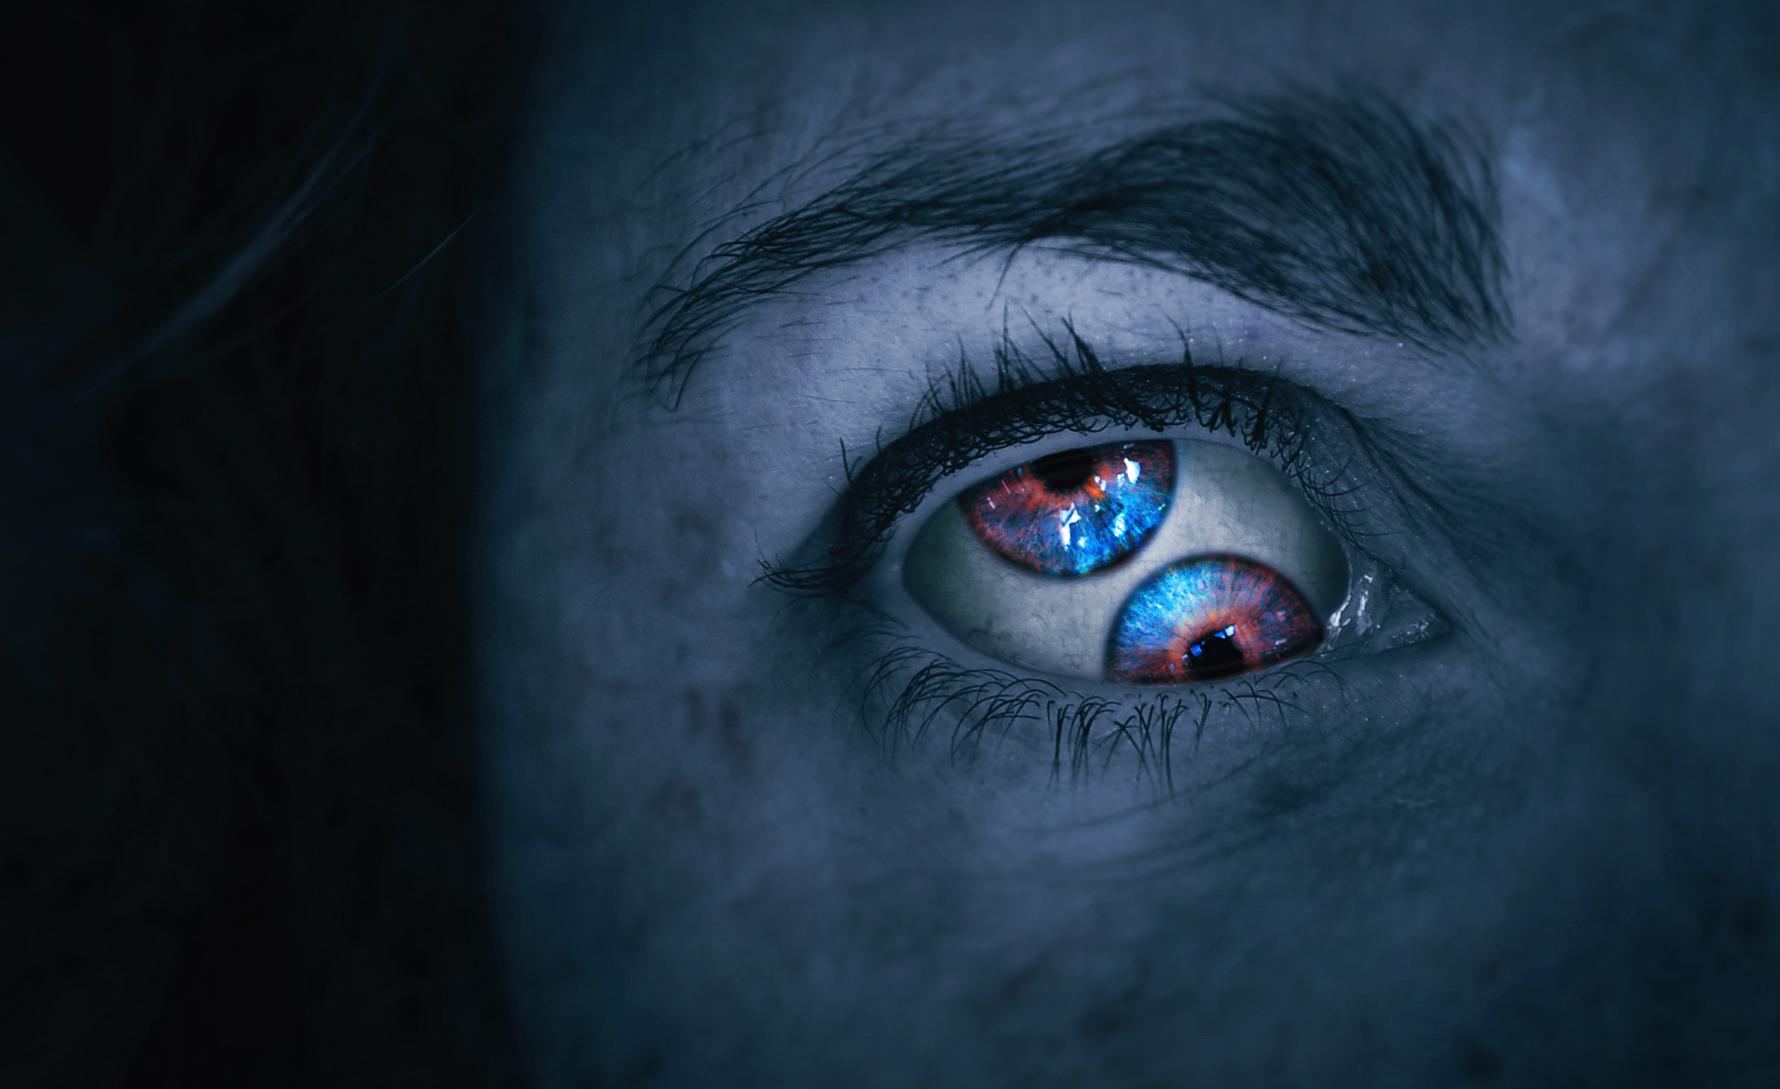 Wallpaper Face Dark Halloween Blue Vision Emotion Terror Tool Iris Change Eyeball Eye Woman Mujer Darkness Monster Cara Fantasy